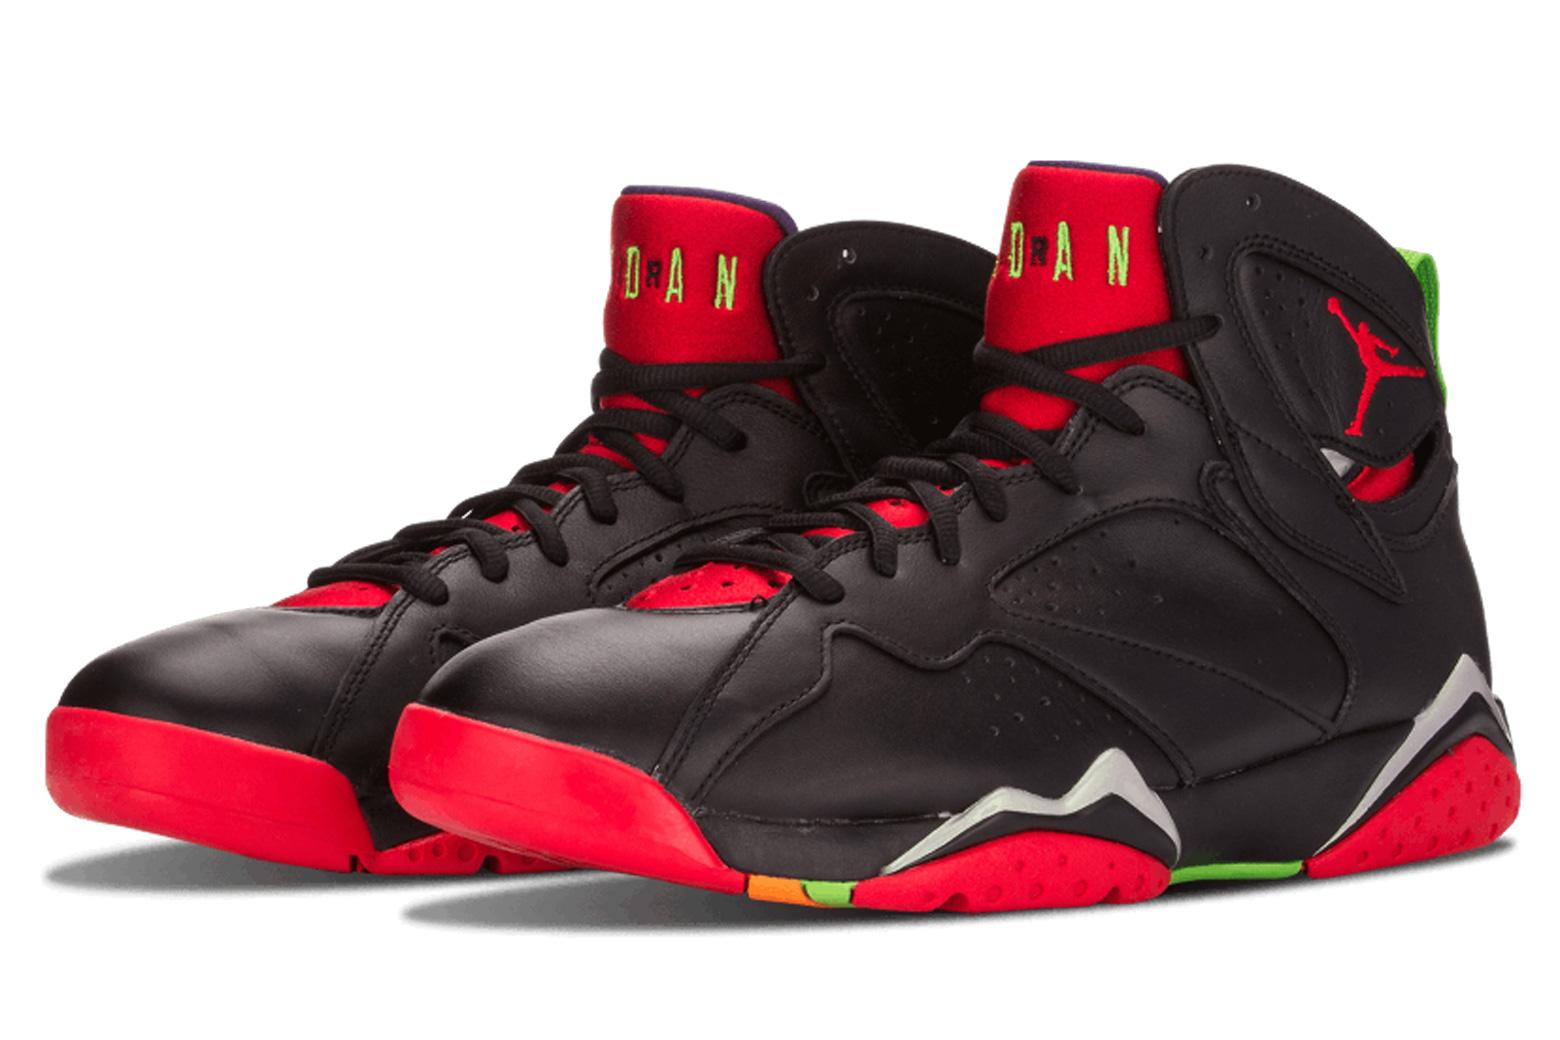 chaussures de séparation d7163 8bafd Stadium Goods 50 Best Selling Sneakers Of 2016 - Air Jordans ...